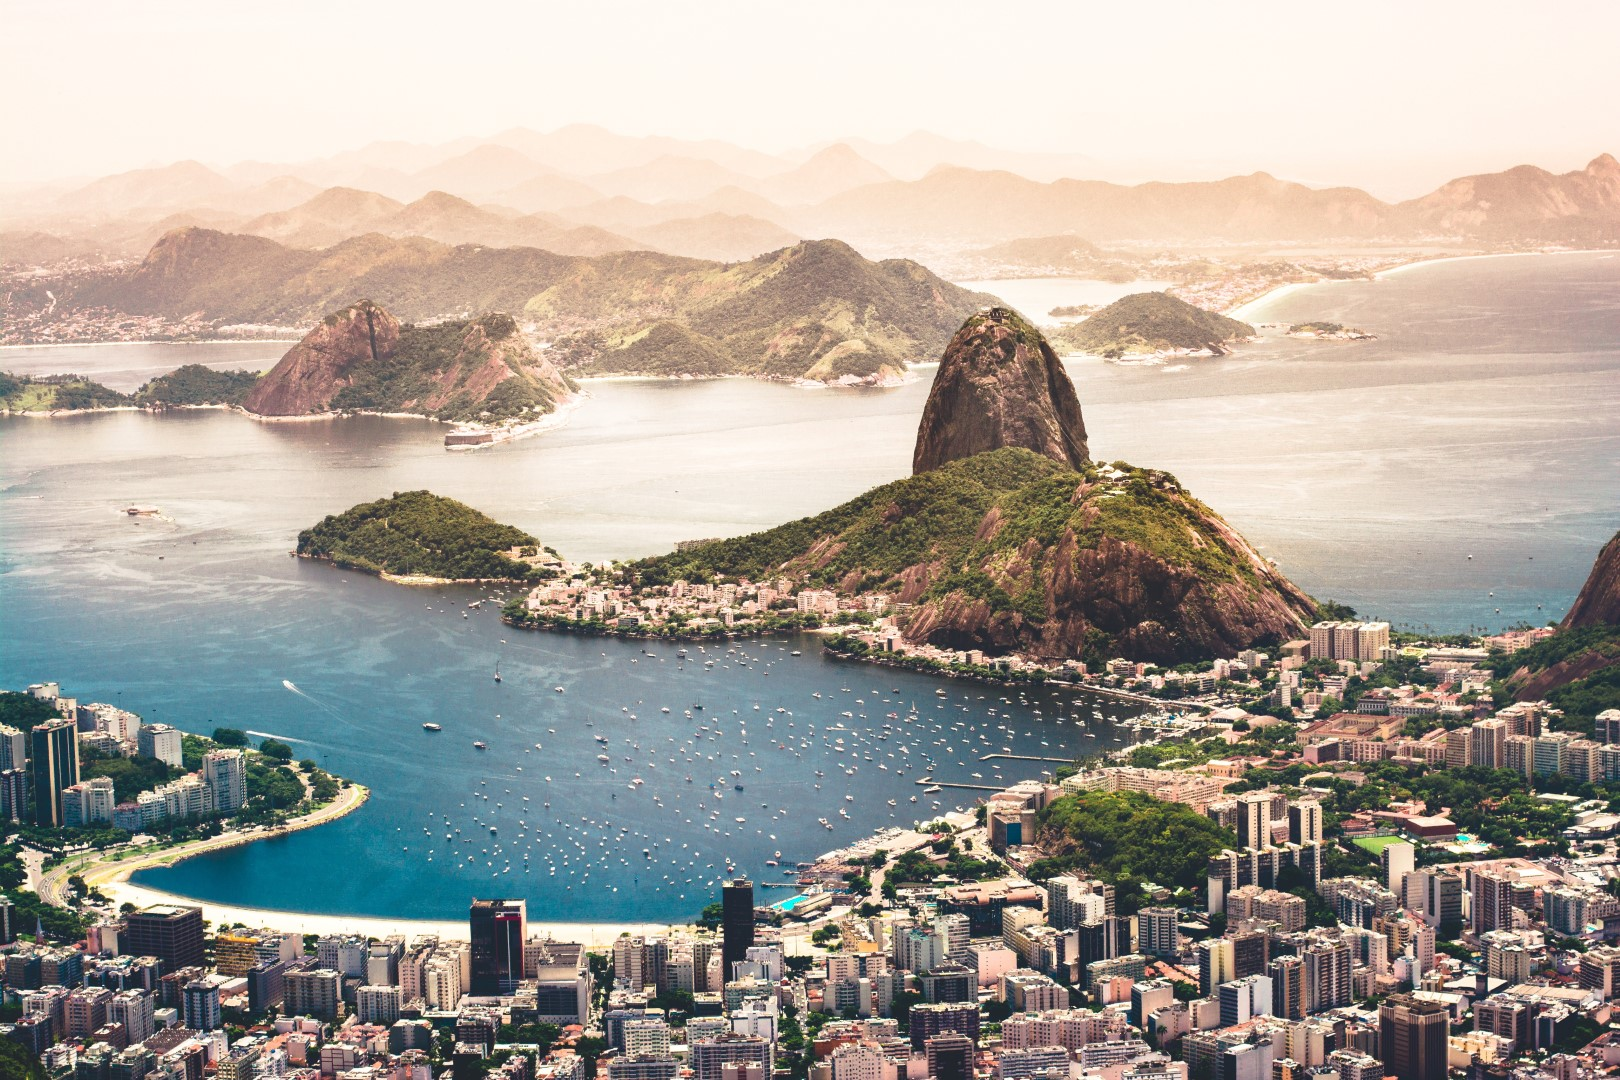 Flug-Deal: Rio de Janeiro mit Kind und Gepäck für 373 € ab Paris (Business Class 1419 €)